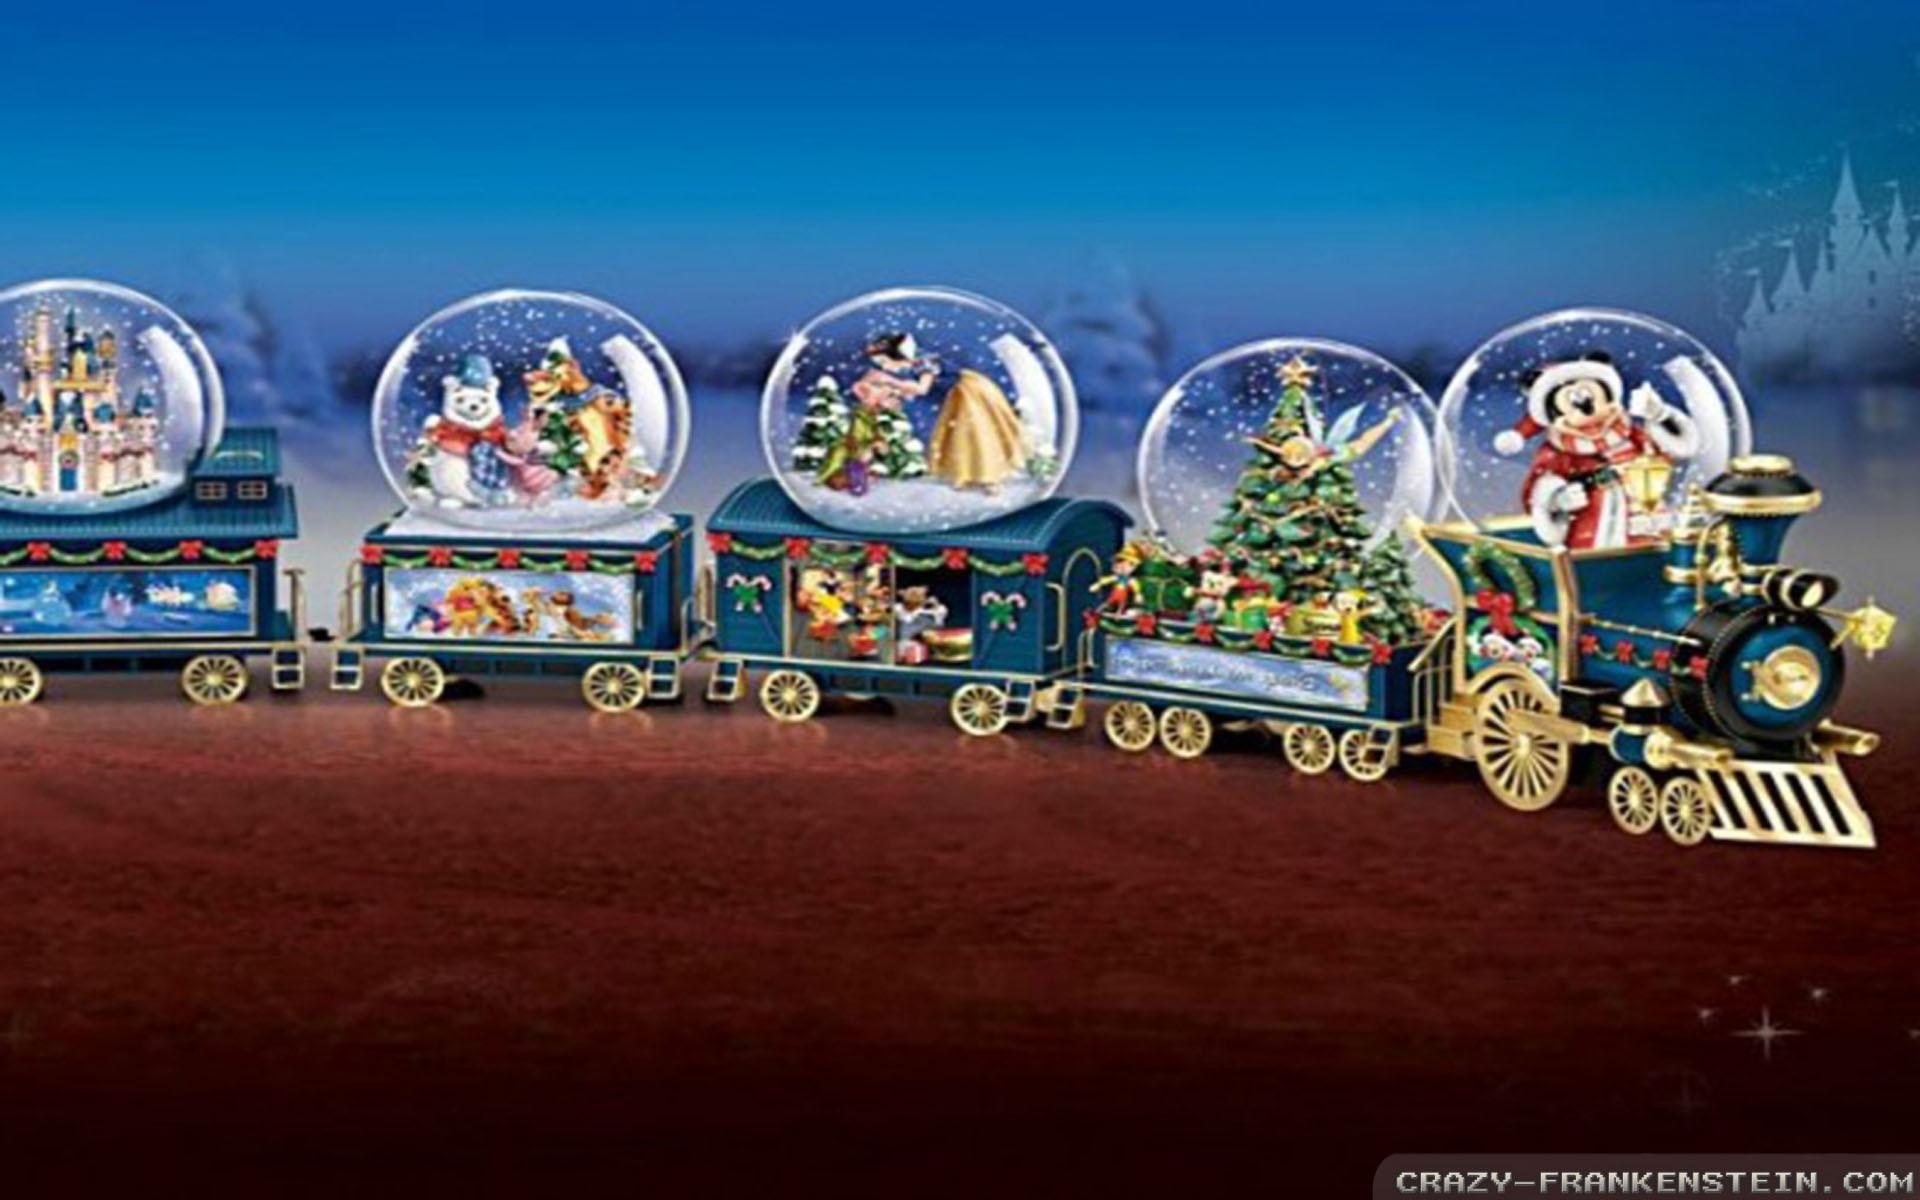 Wallpaper: Snowglobe disney Christmas wallpapers. Resolution: 1024×768 |  1280×1024 | 1600×1200. Widescreen Res: 1440×900 | 1680×1050 | 1920×1200